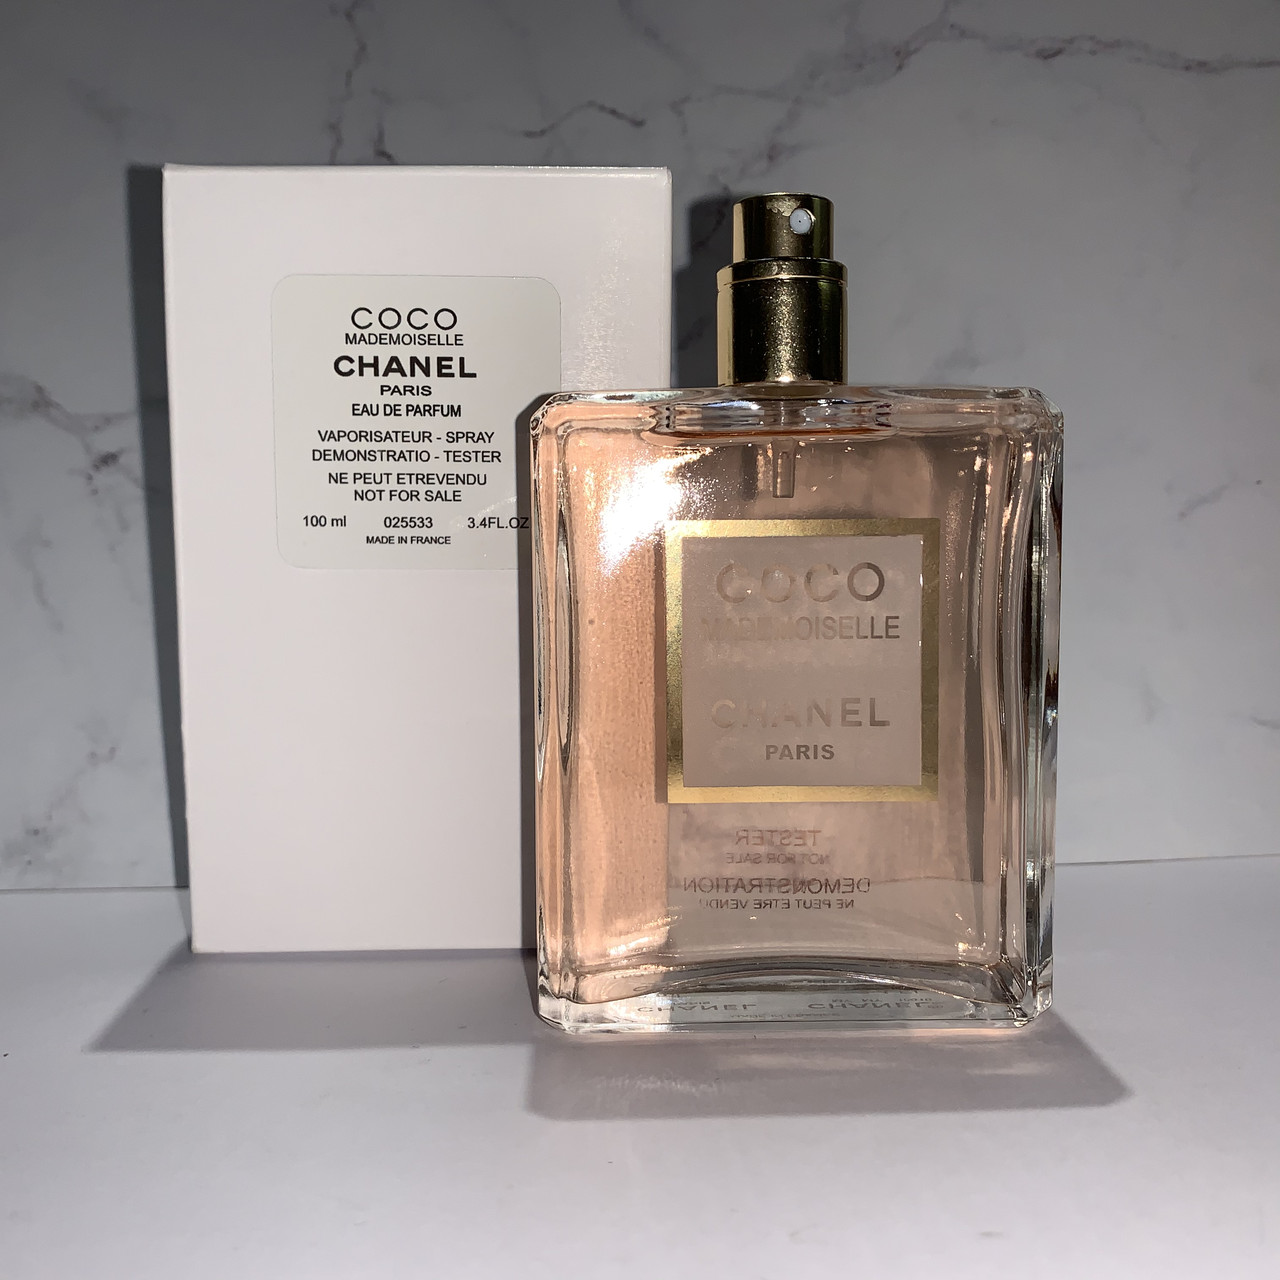 Chanel Coco Mademoiselle парфюмированная вода 100 ml. (Тестер Шанель Коко Мадмуазель)